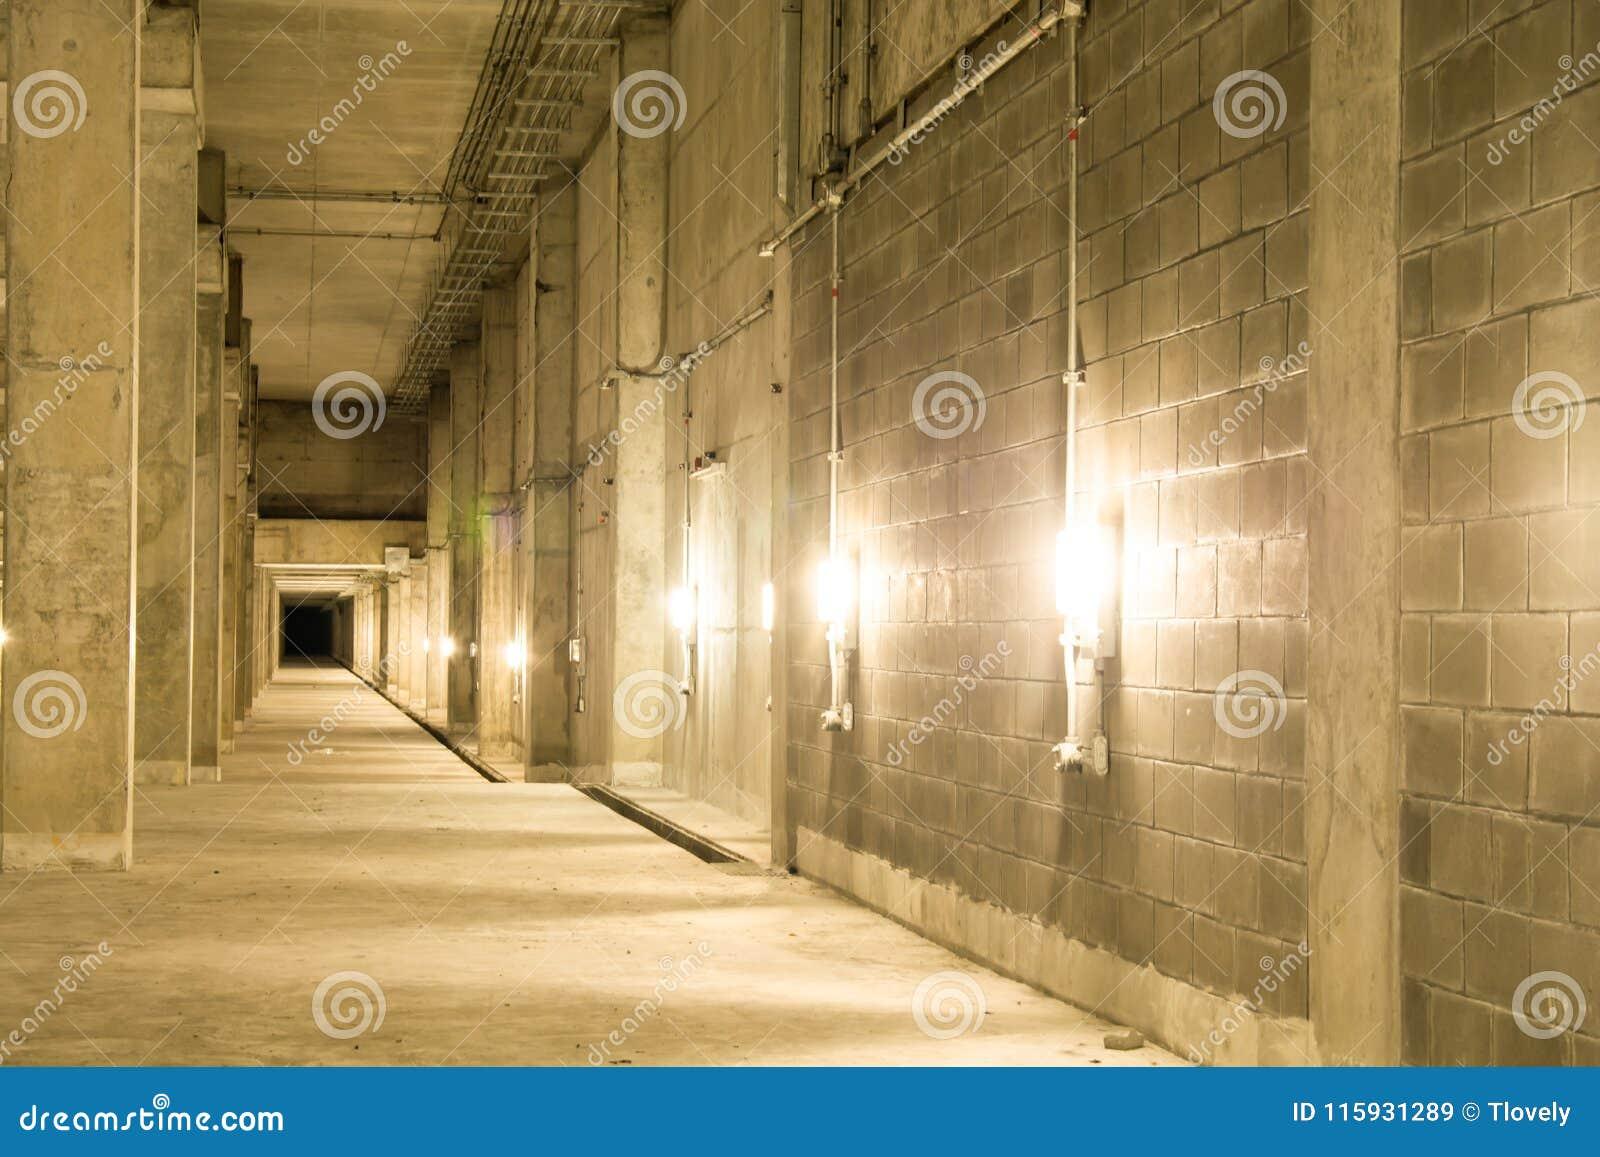 Empty Industrial Garage Room Interior With Concrete. Stock Image ...